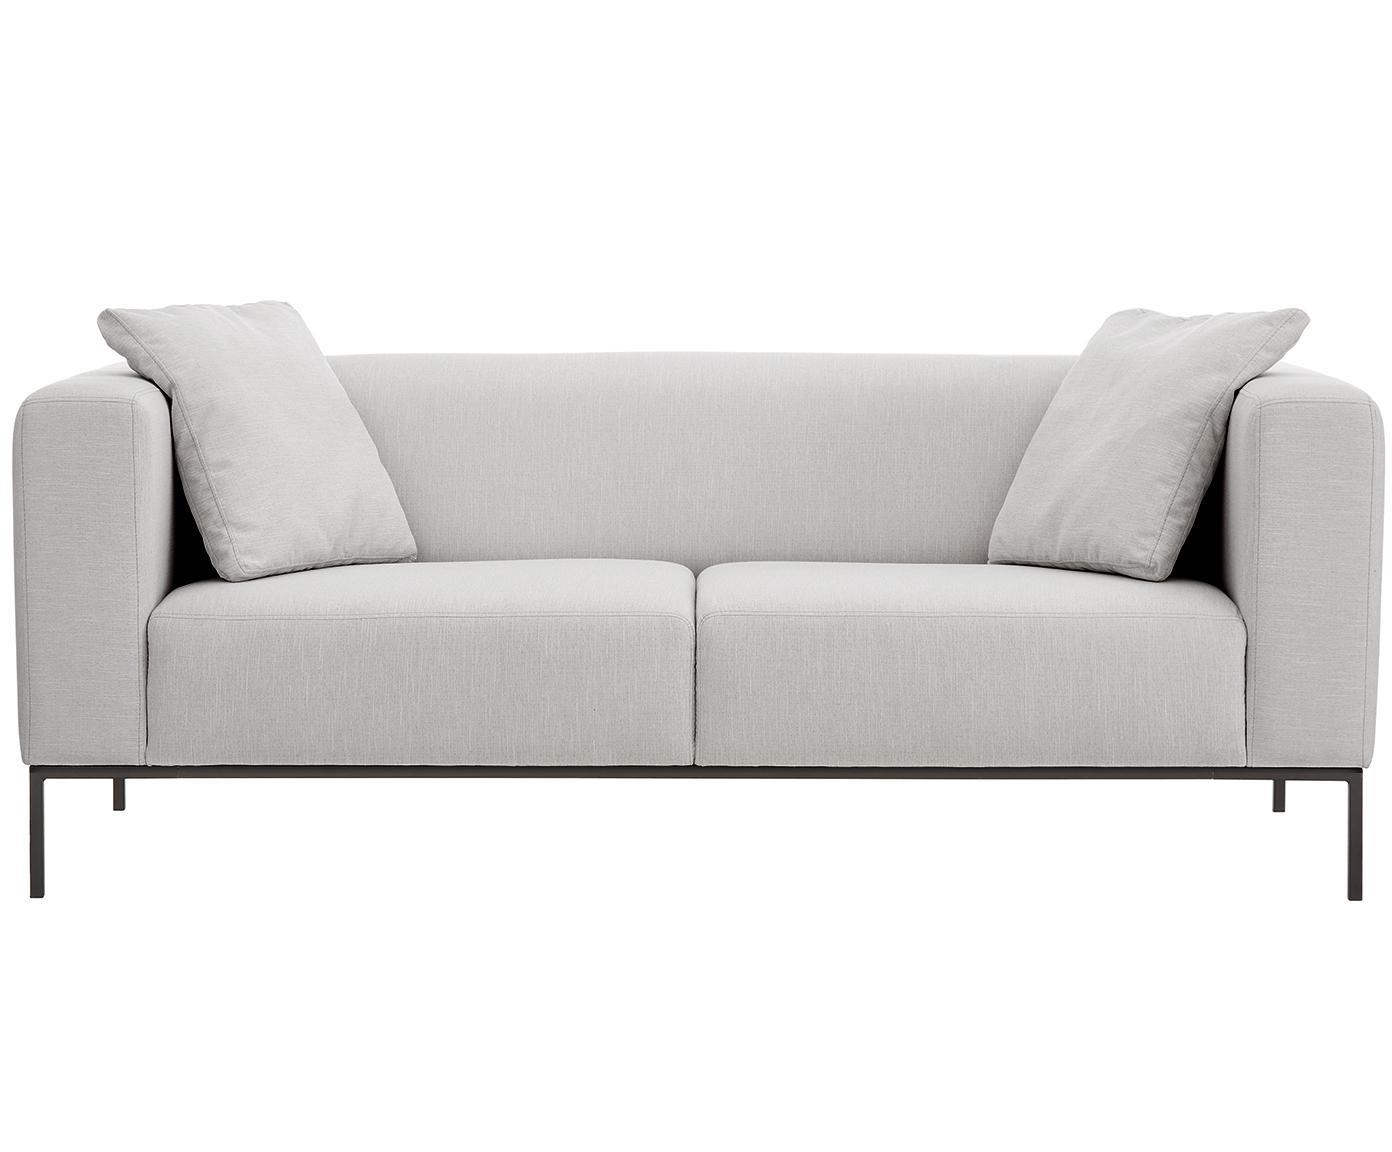 Sofa Carrie (3-Sitzer), Bezug: Polyester 50.000 Scheuert, Gestell: Spanholz, Hartfaserplatte, Webstoff Grau, B 202 x T 86 cm